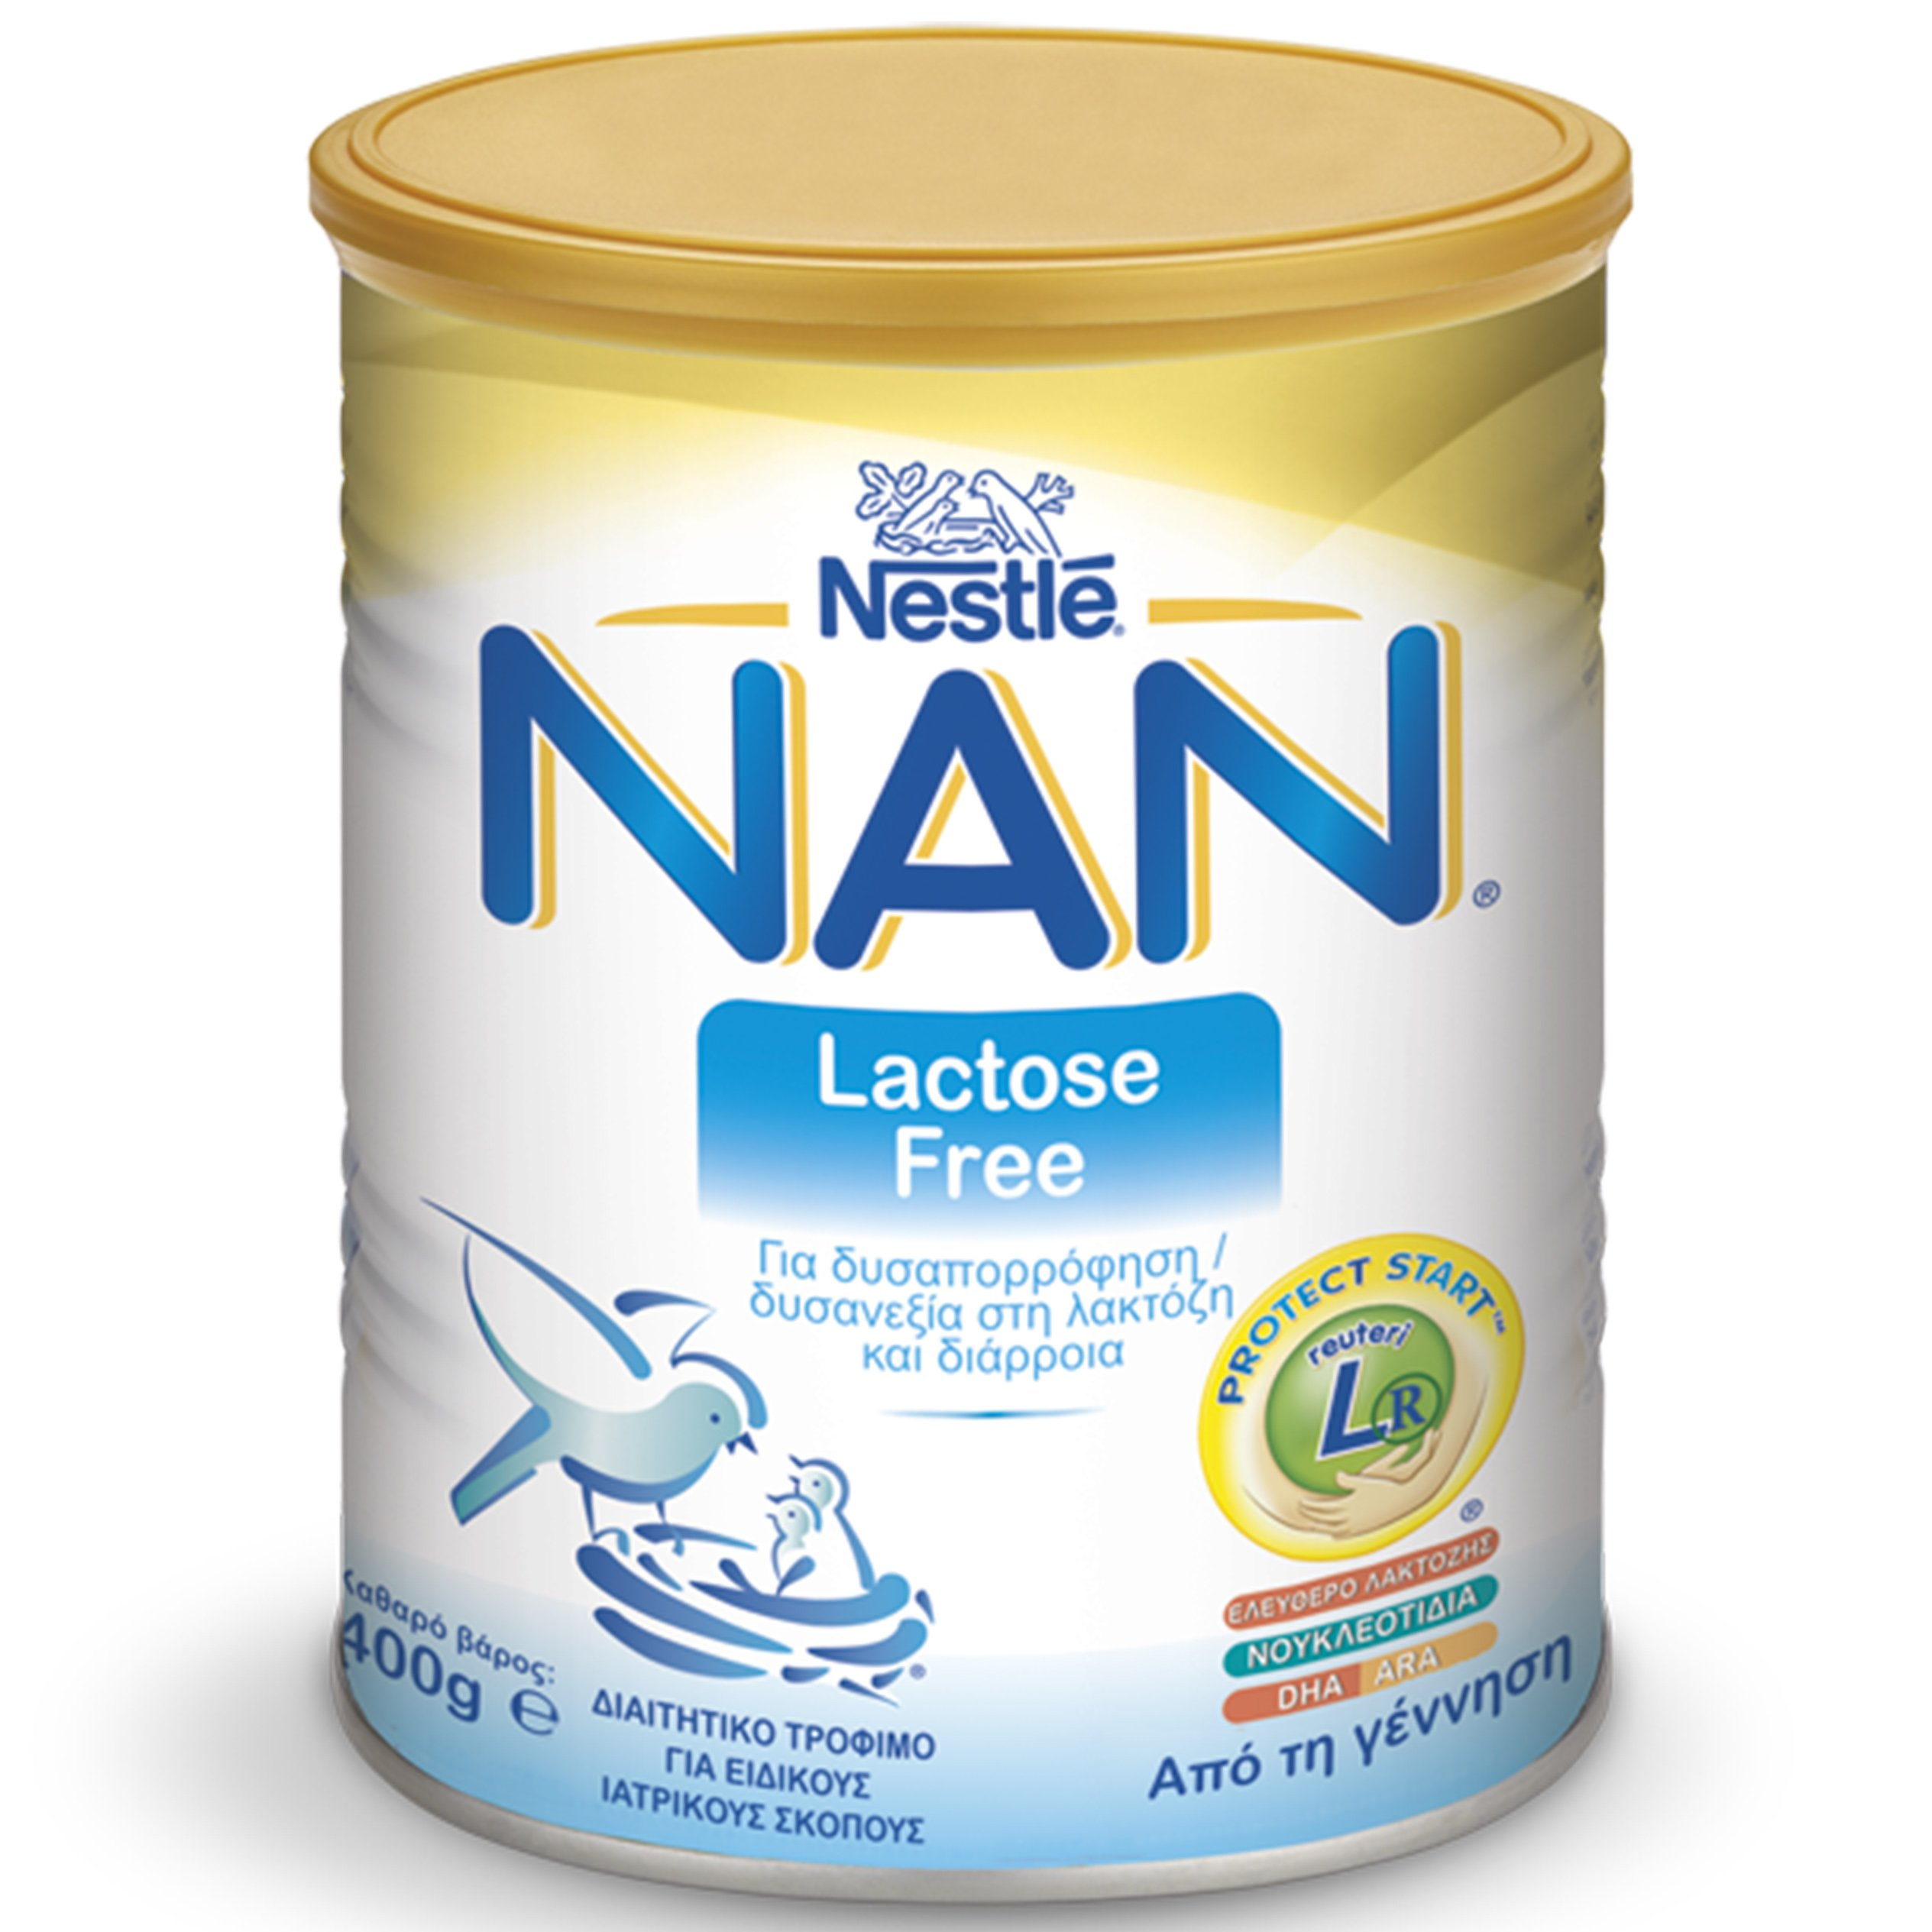 Nestle NAN Lactose Free Βρεφικό Γάλα σε Σκόνη για Δυσαπορρόφηση/Δυσανεξία στη Λακτόζη & Διάρροια,Κατάλληλο Από την Γέννηση 400gr